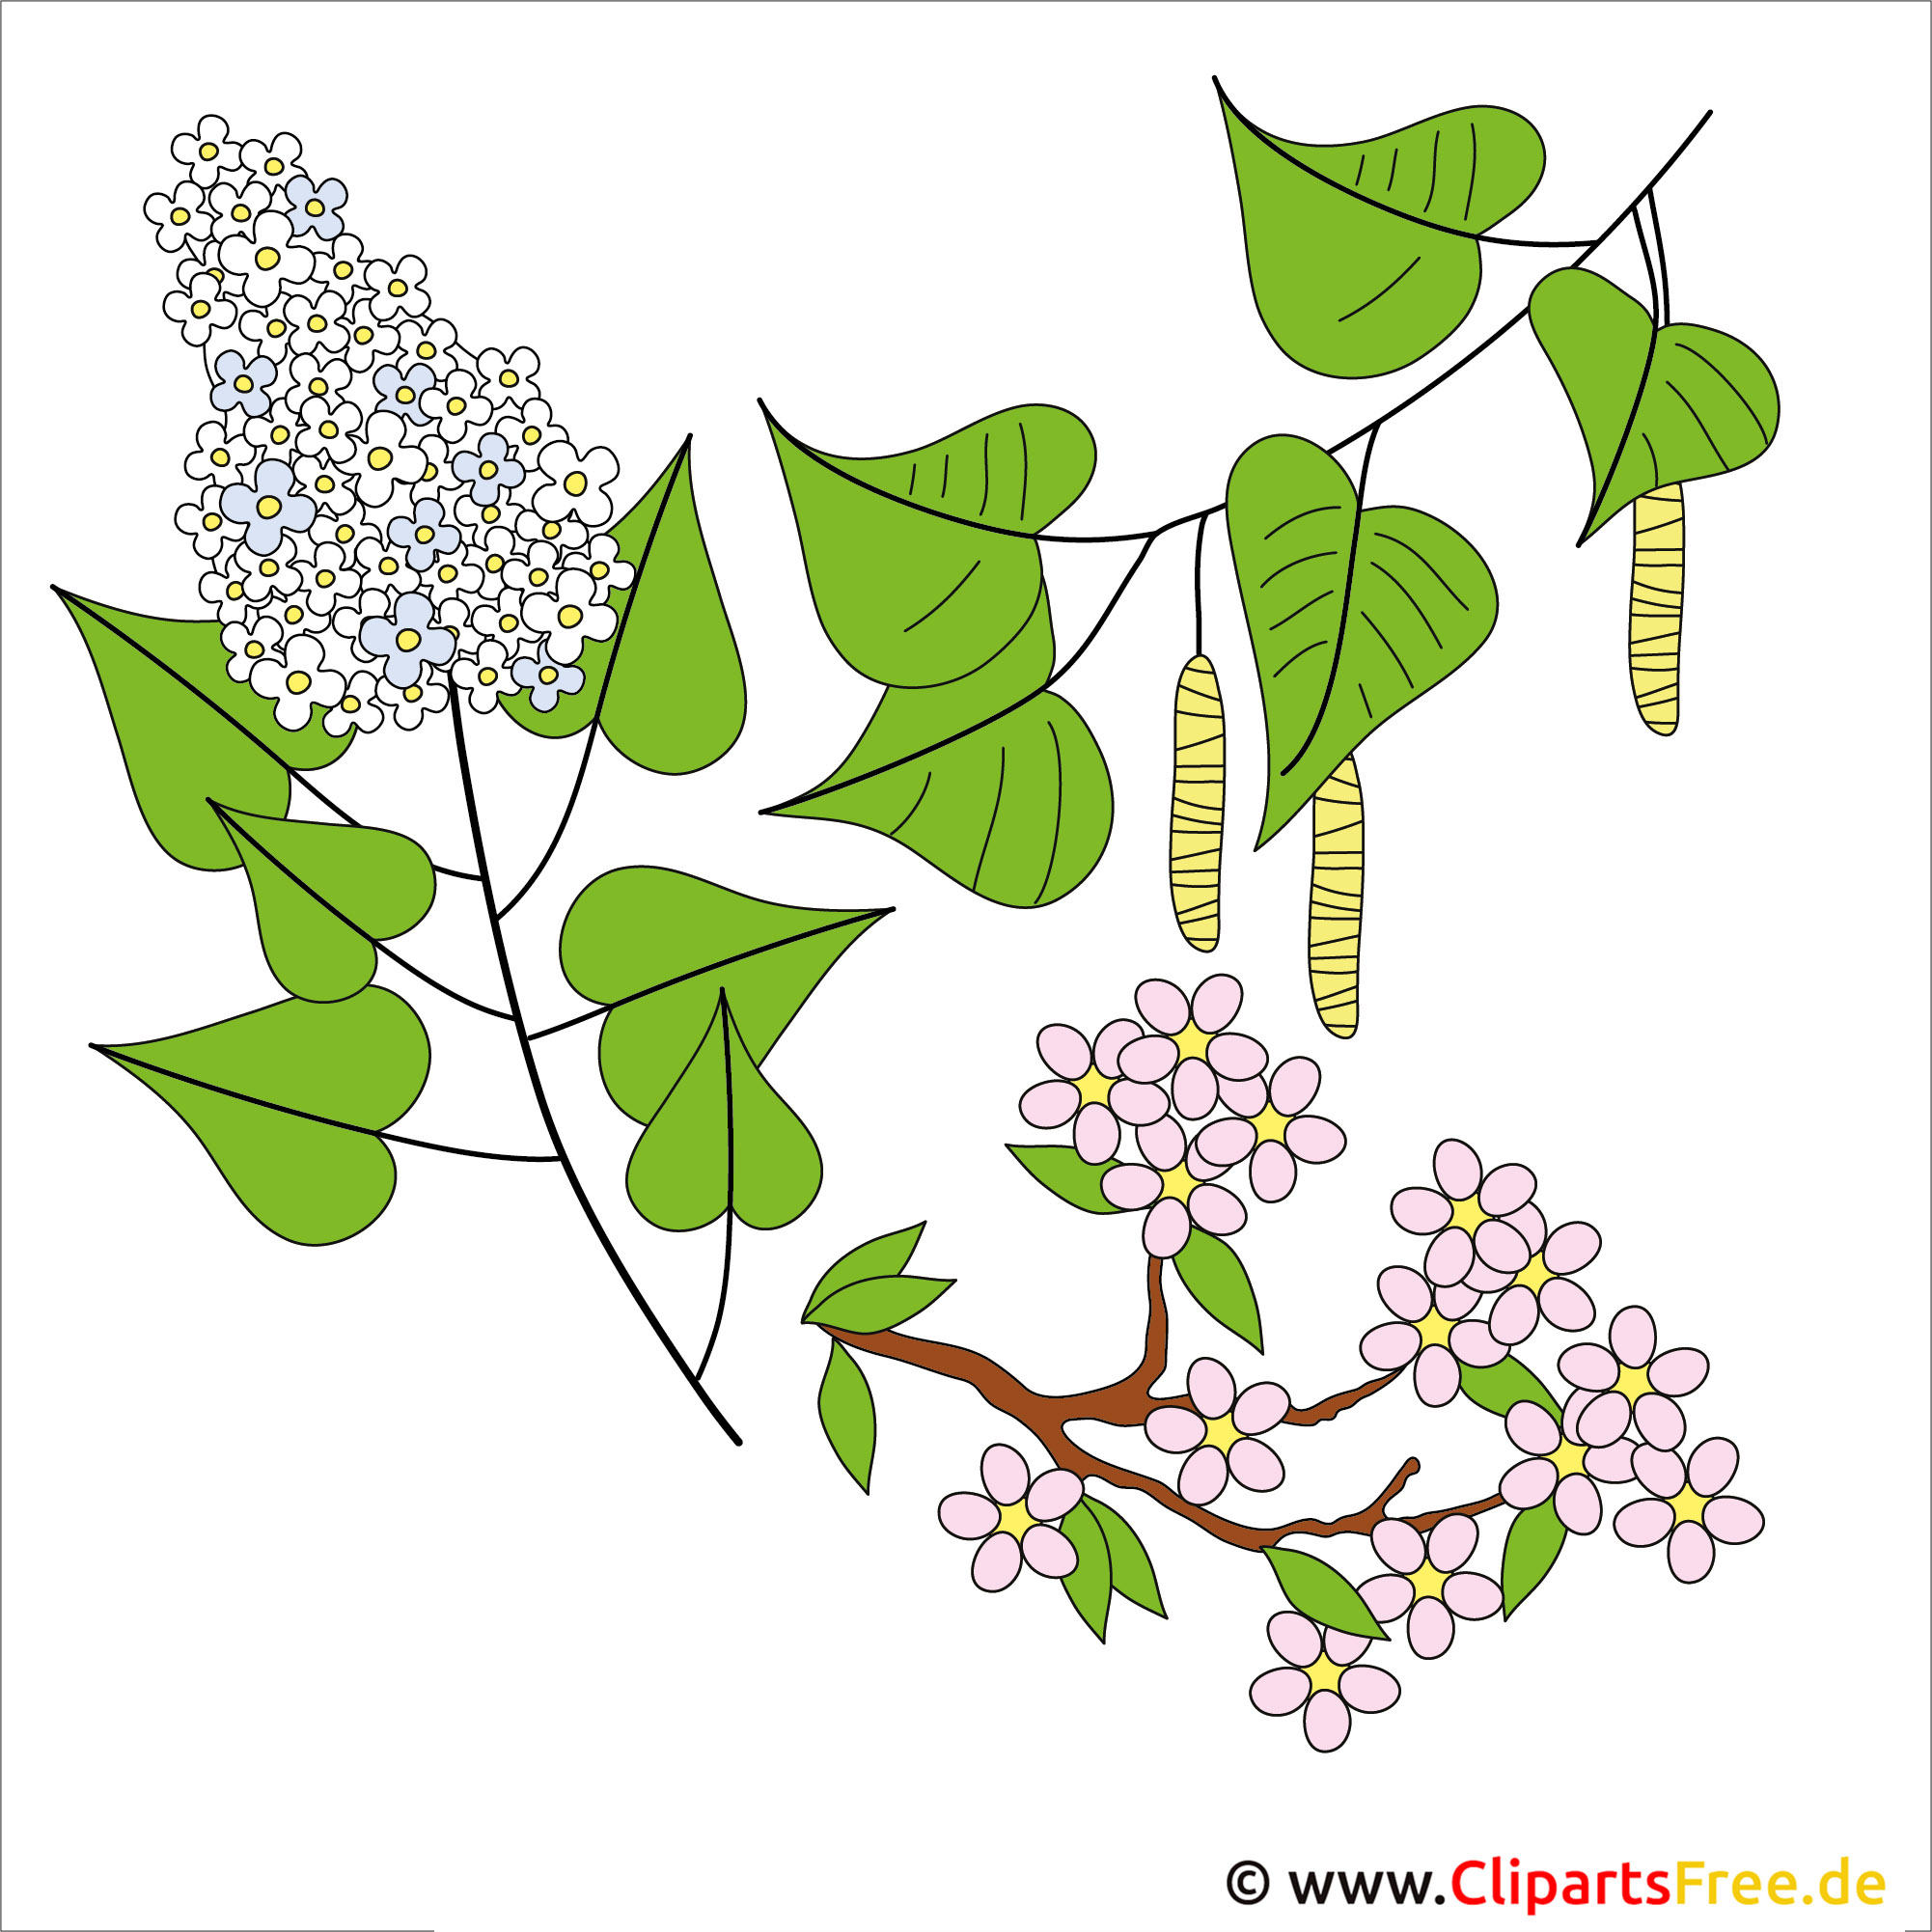 Frühling Cliparts kostenlos - Birke